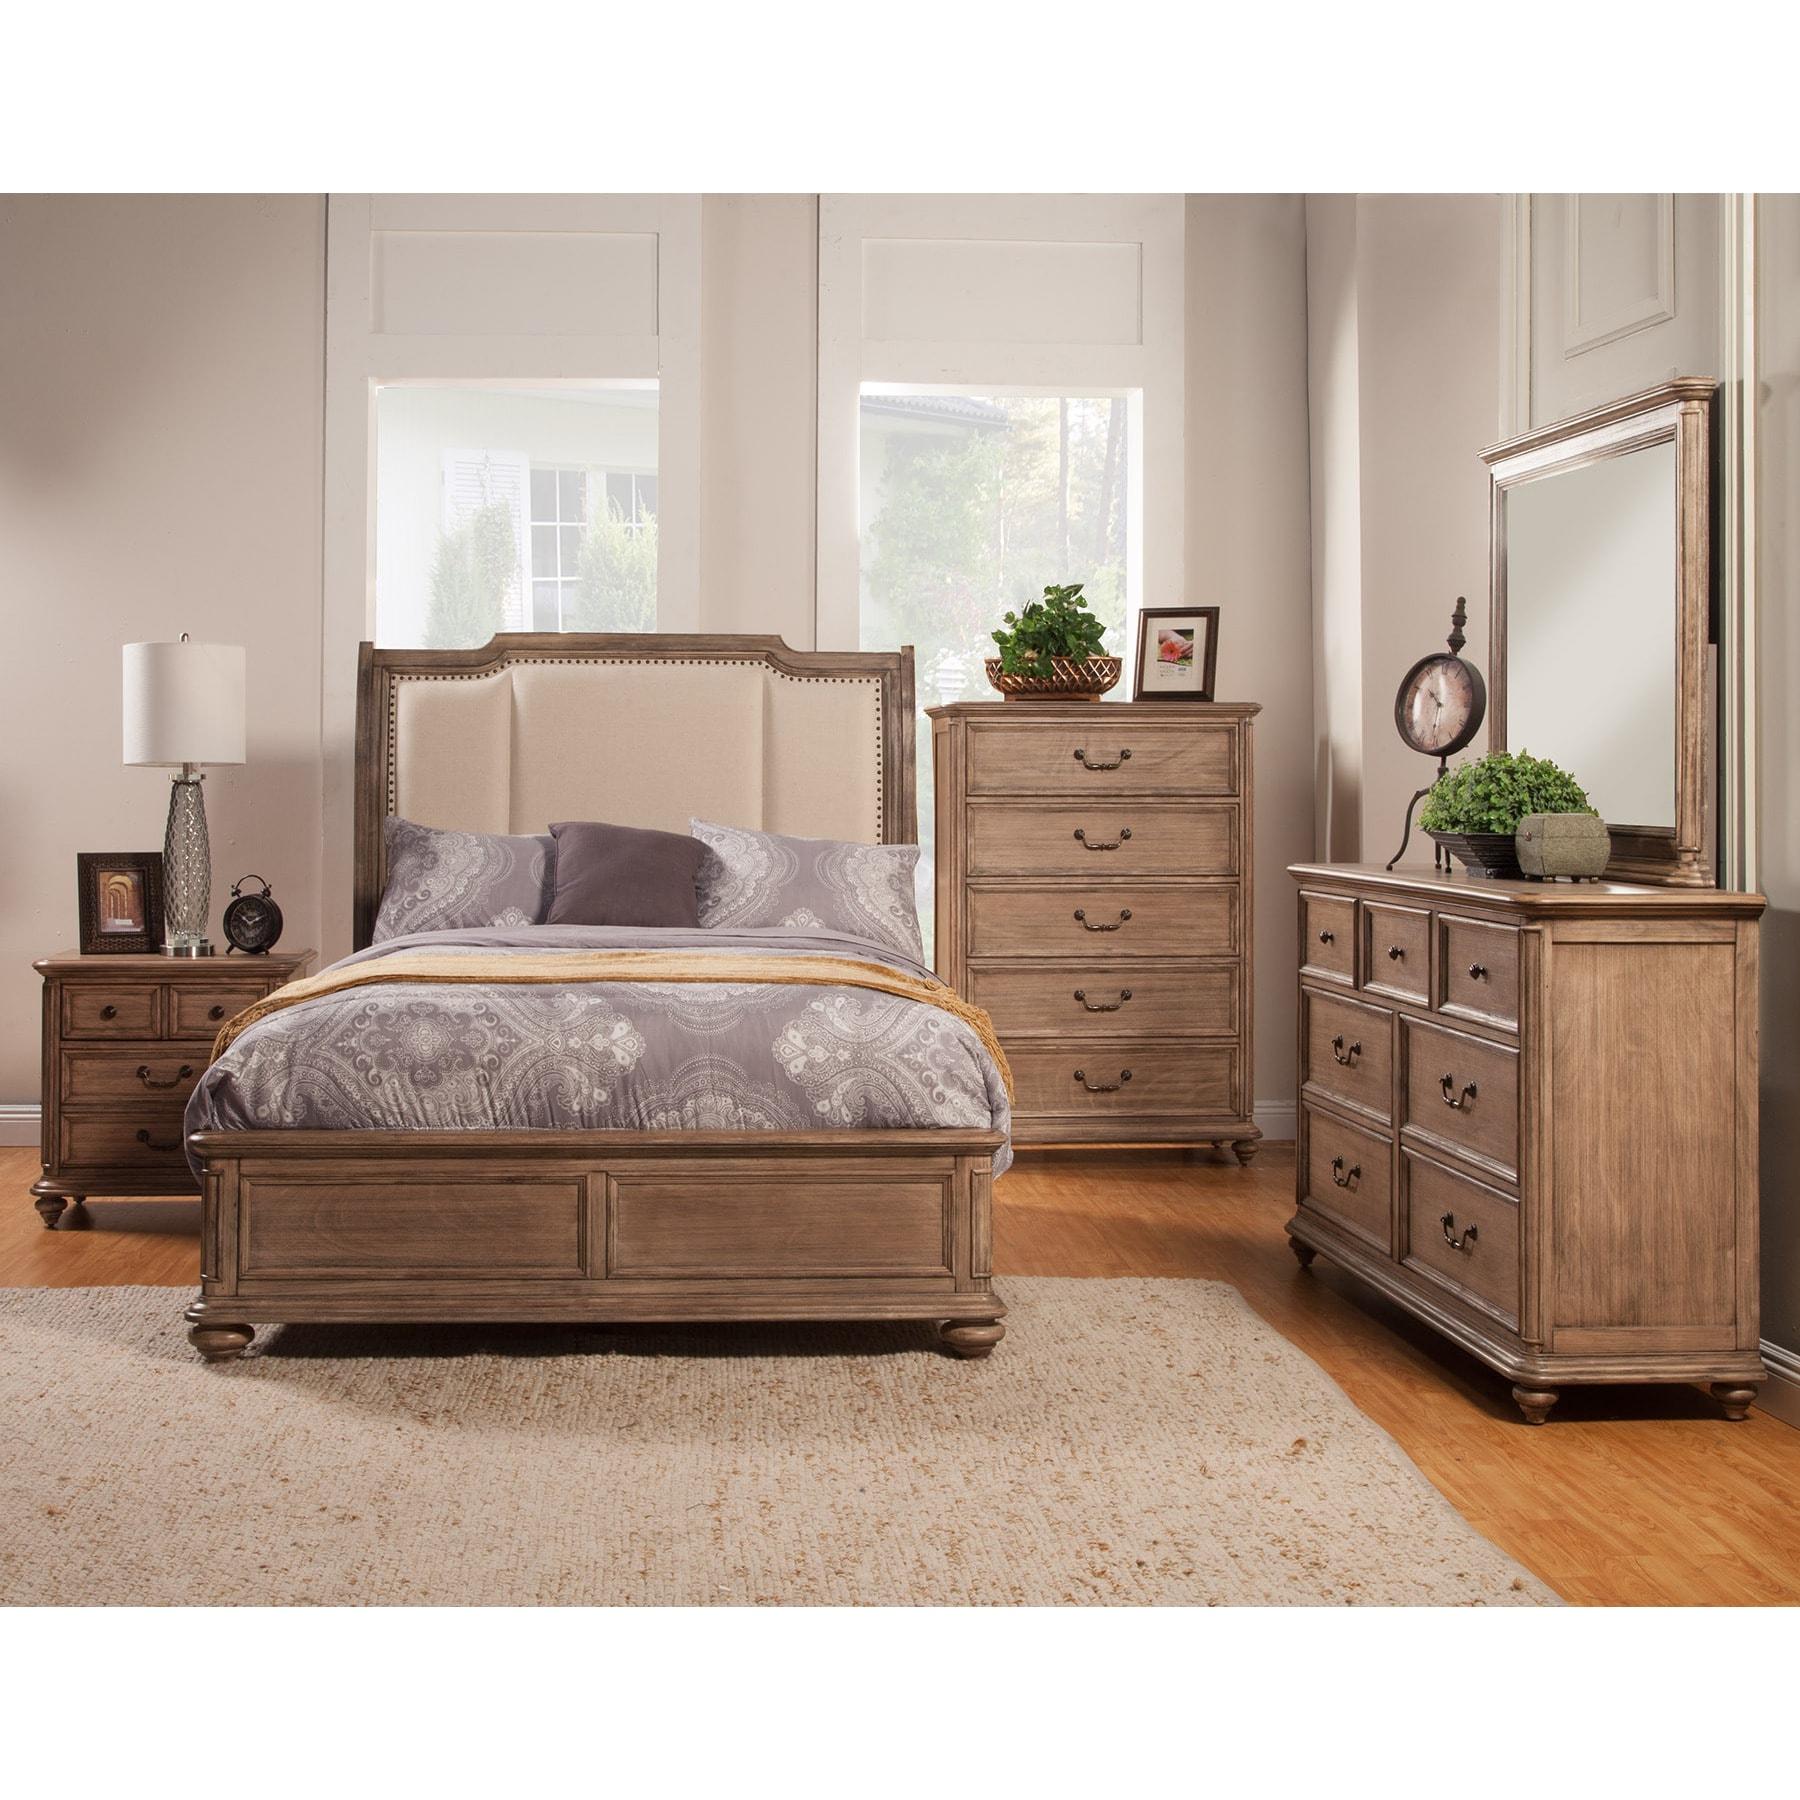 Shop Alpine Melbourne 7 Drawer Dresser On Sale Free Shipping Today Overstock Com 13009186